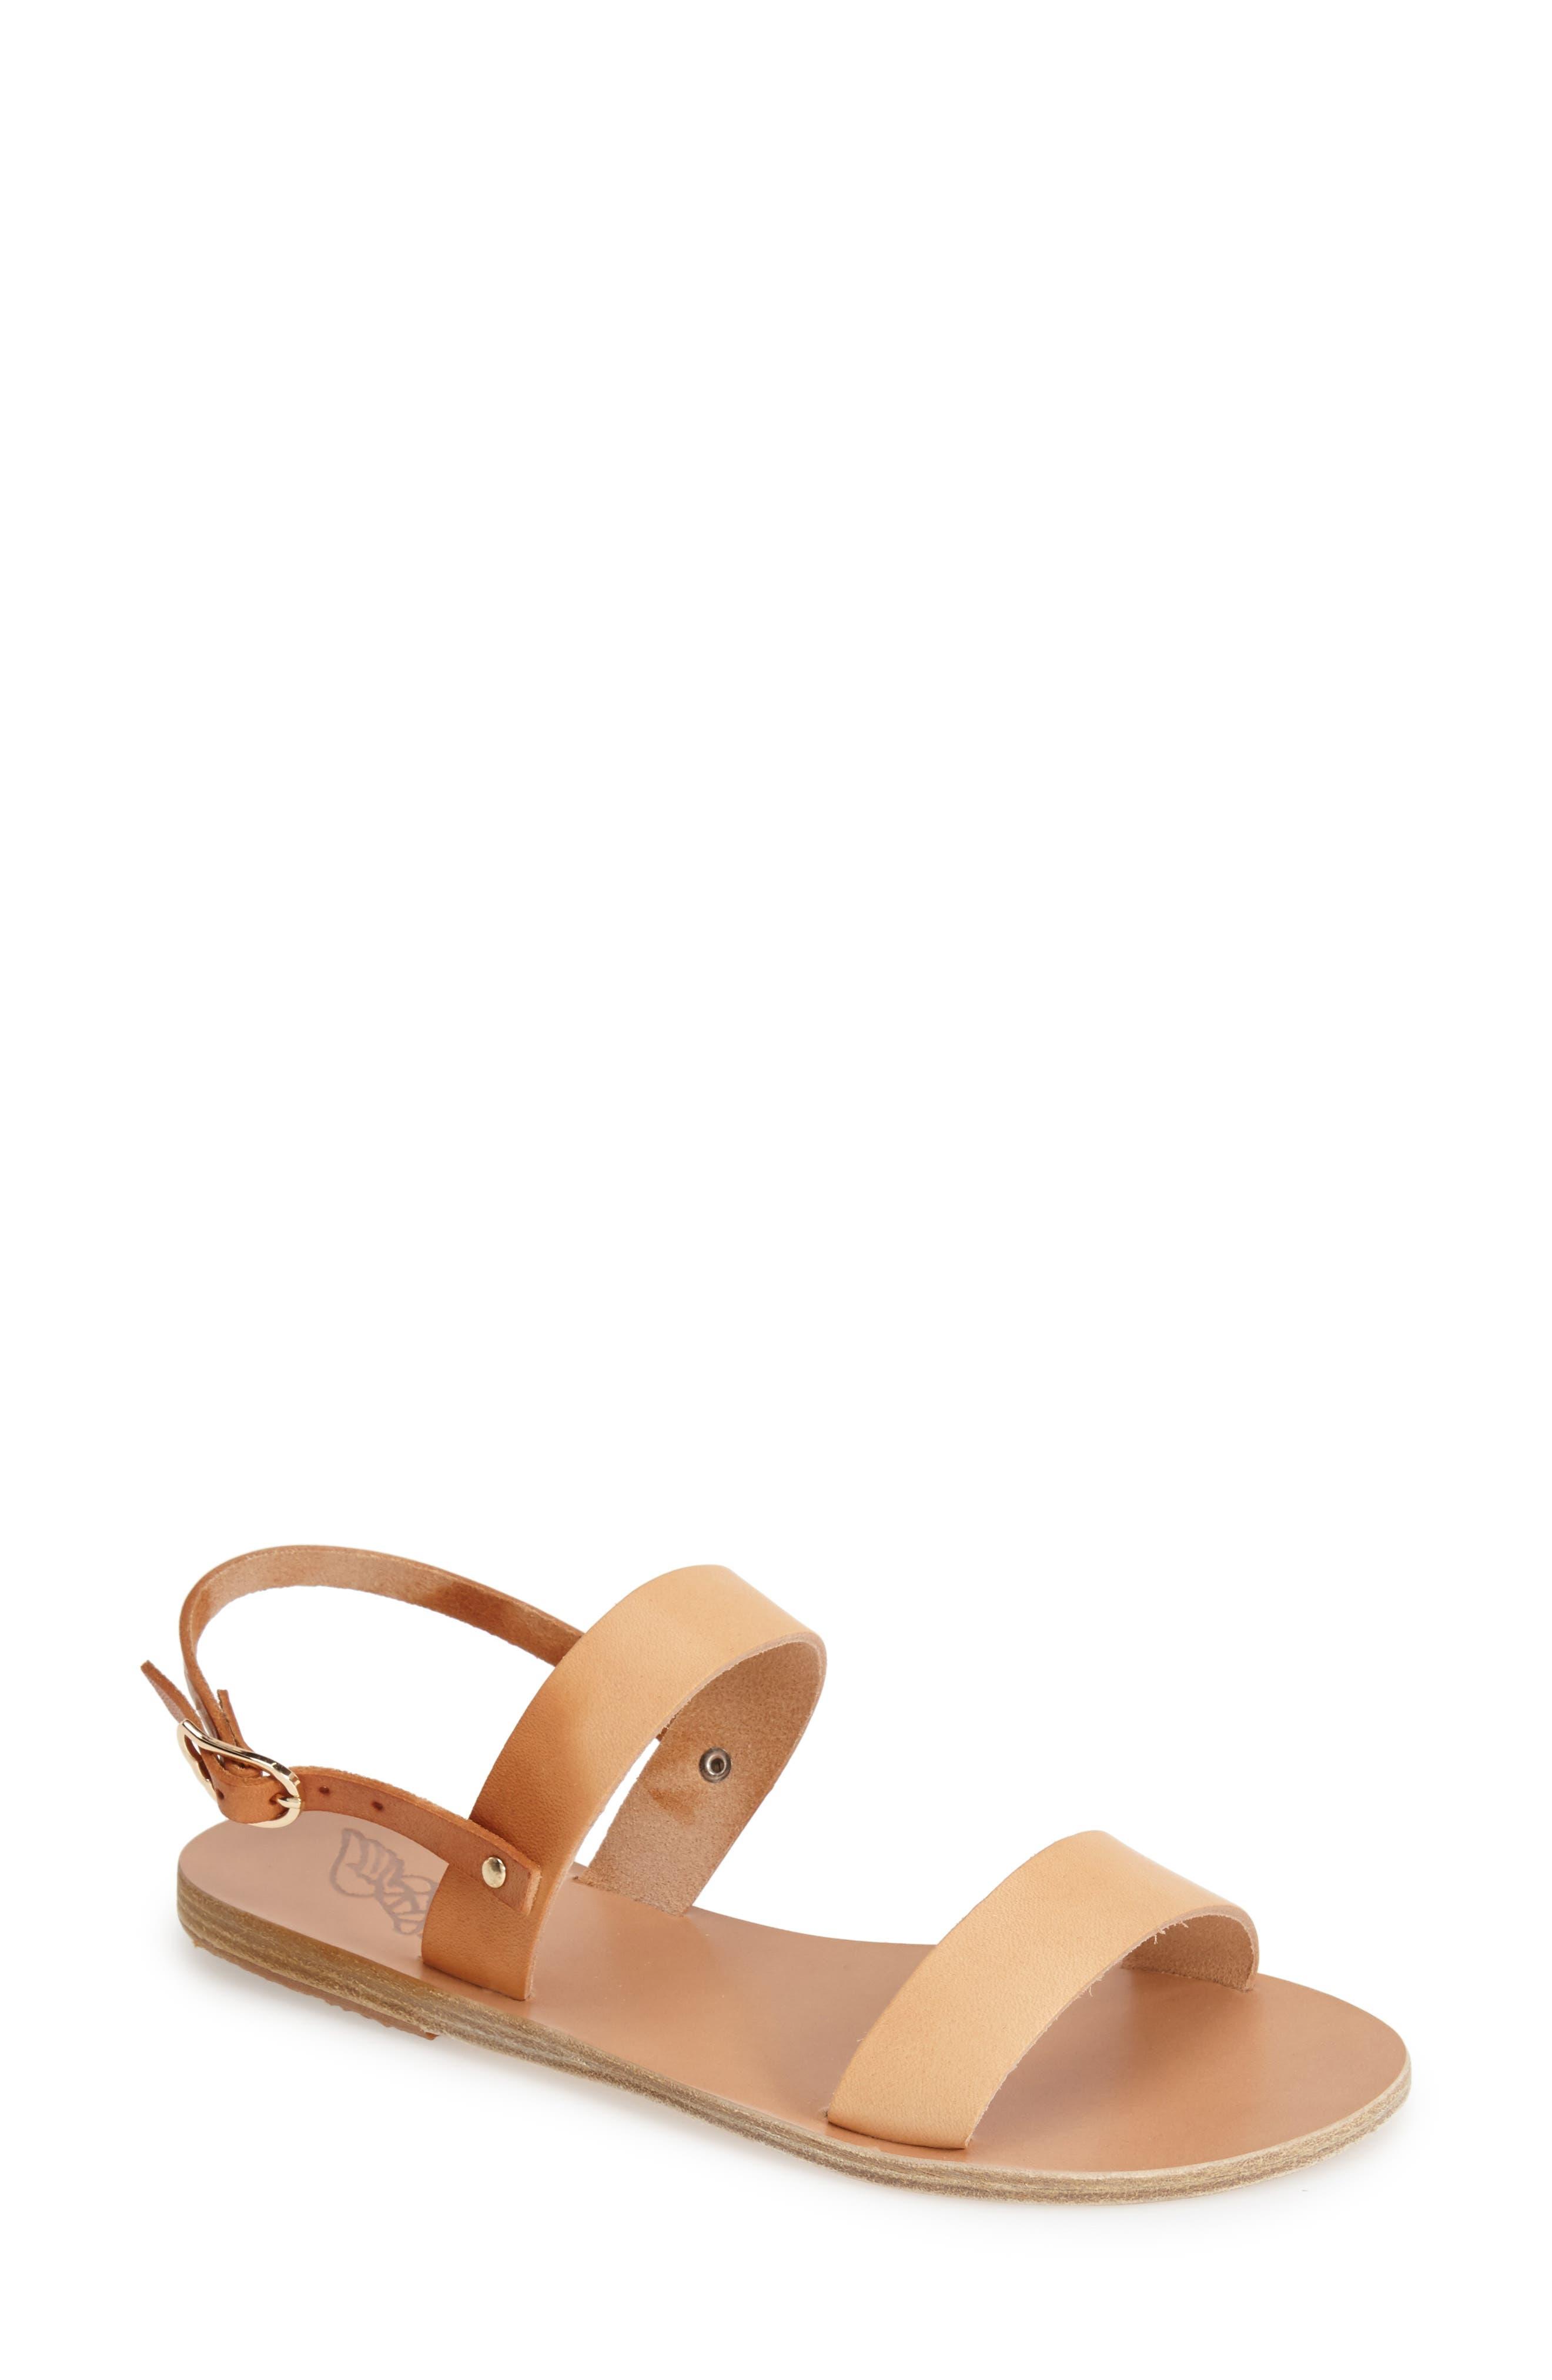 Alternate Image 1 Selected - Ancient Greek Sandals Clio Slingback Sandal (Women)